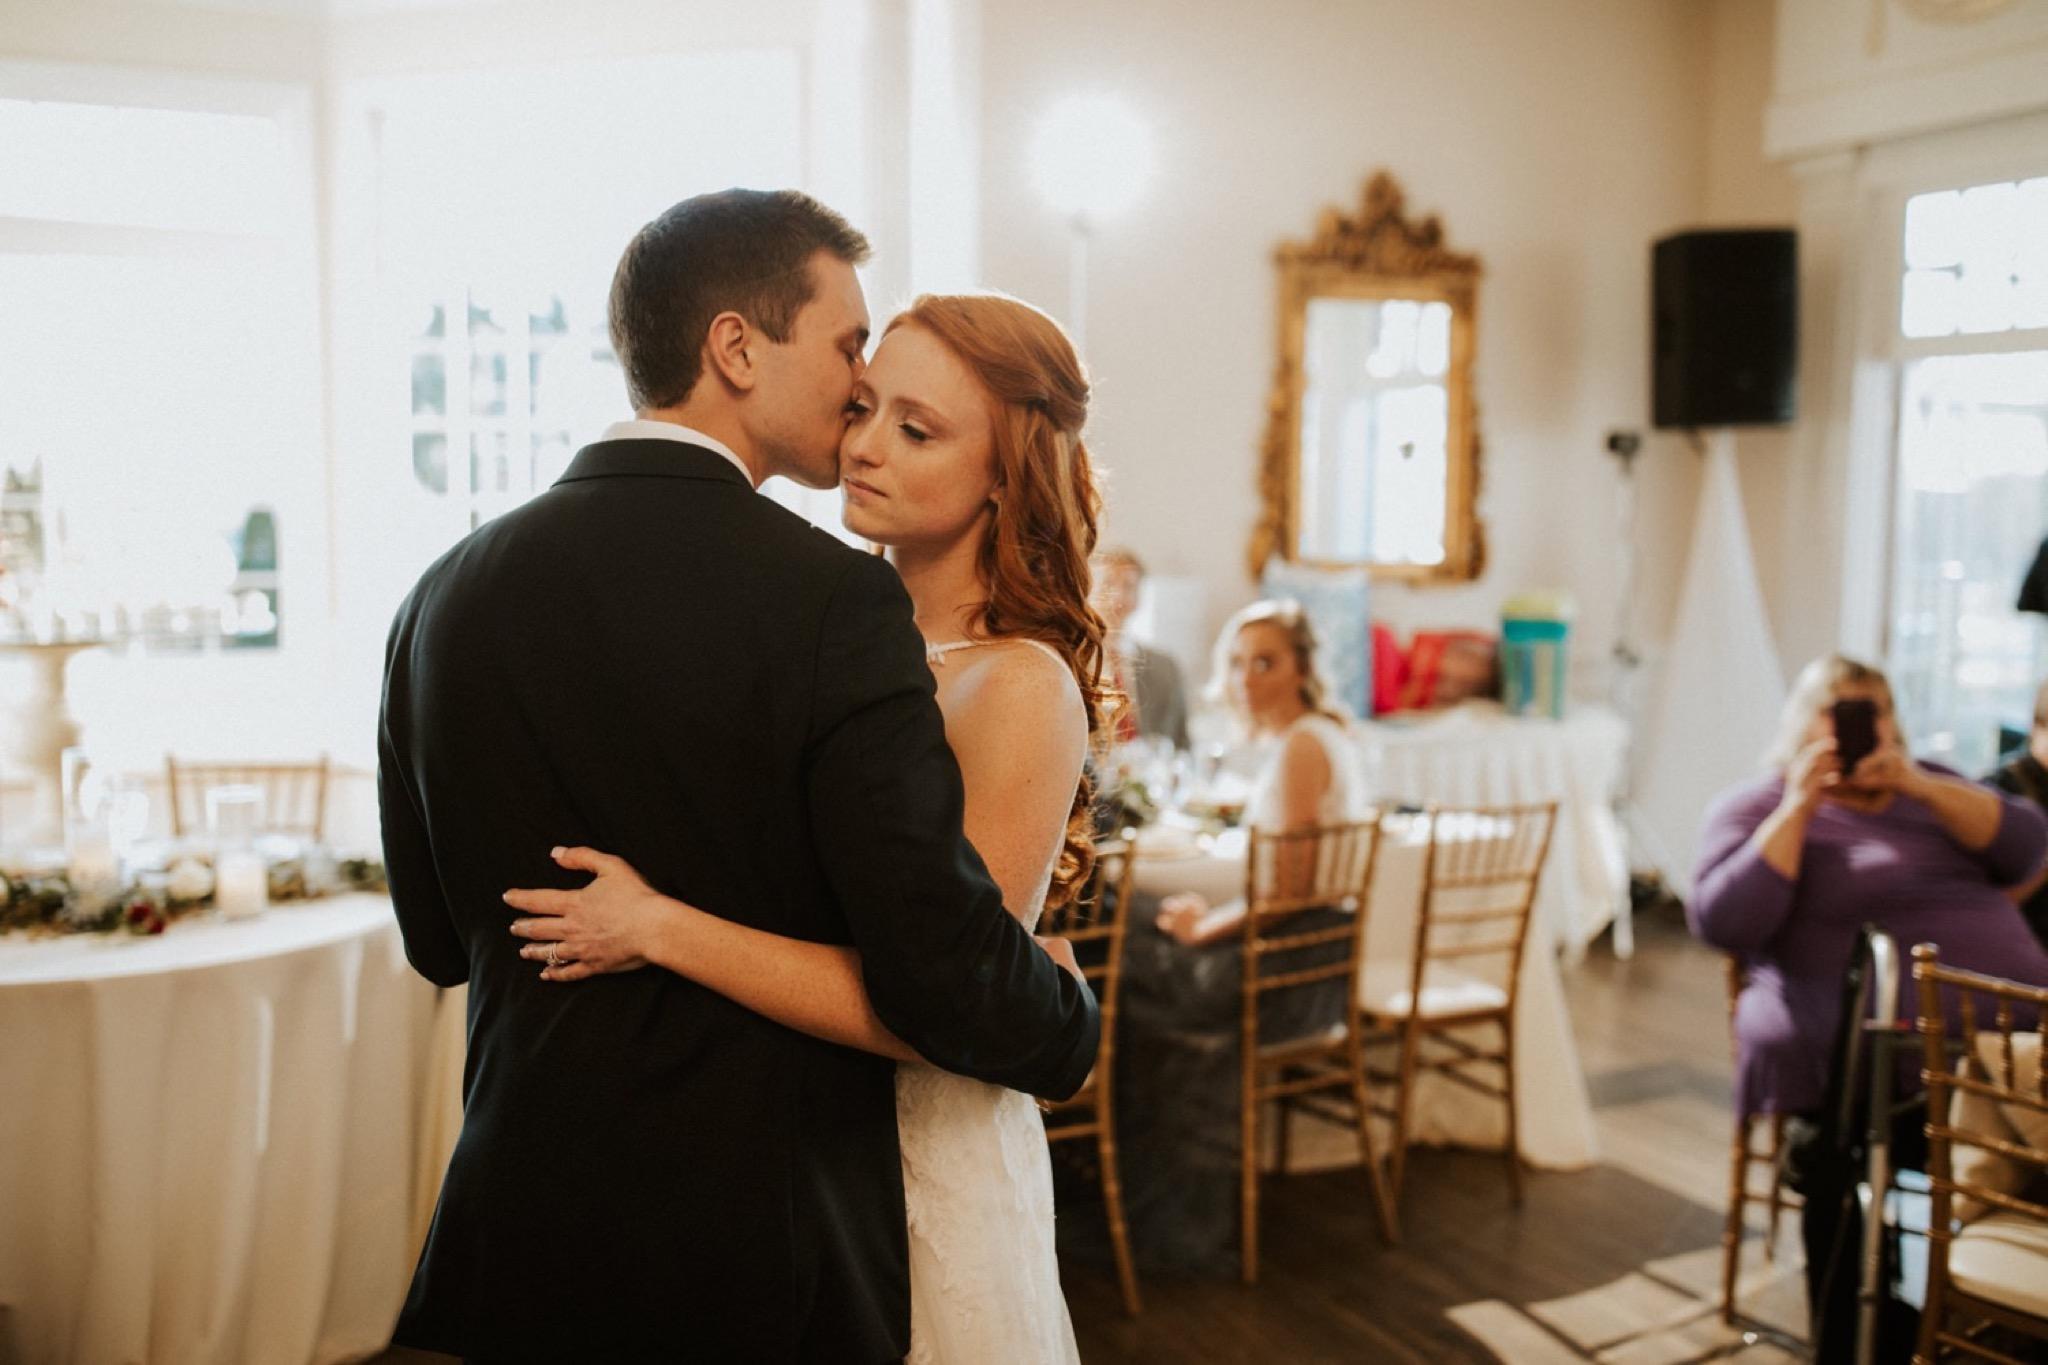 76_West Manor Estate Weddings - Pat Cori Photography-160_VirginiaWeddingPhotographer_WestManorEstate_Firstdance_Wedding.jpg